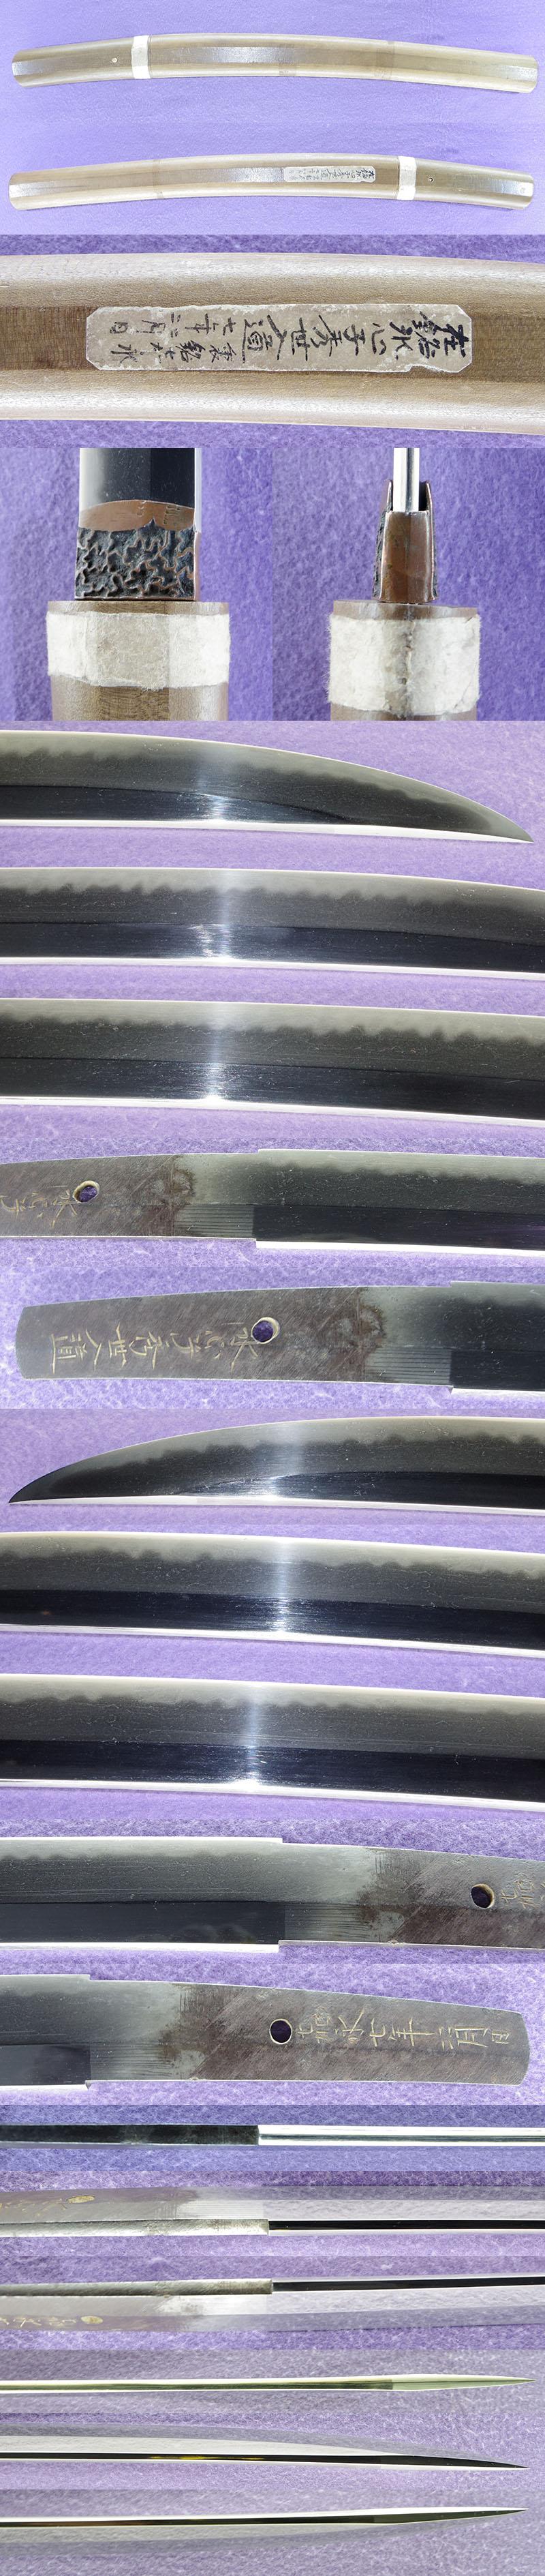 氷心子秀世入道 Picture of parts